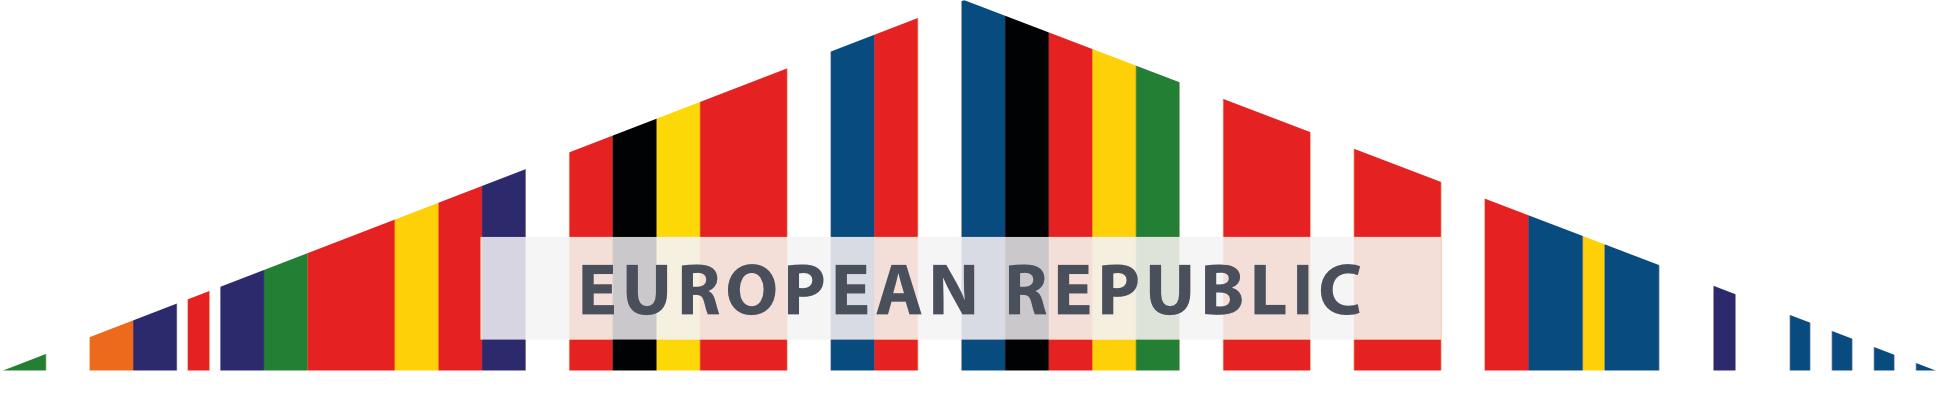 Republikanism i Europa – en kort historik